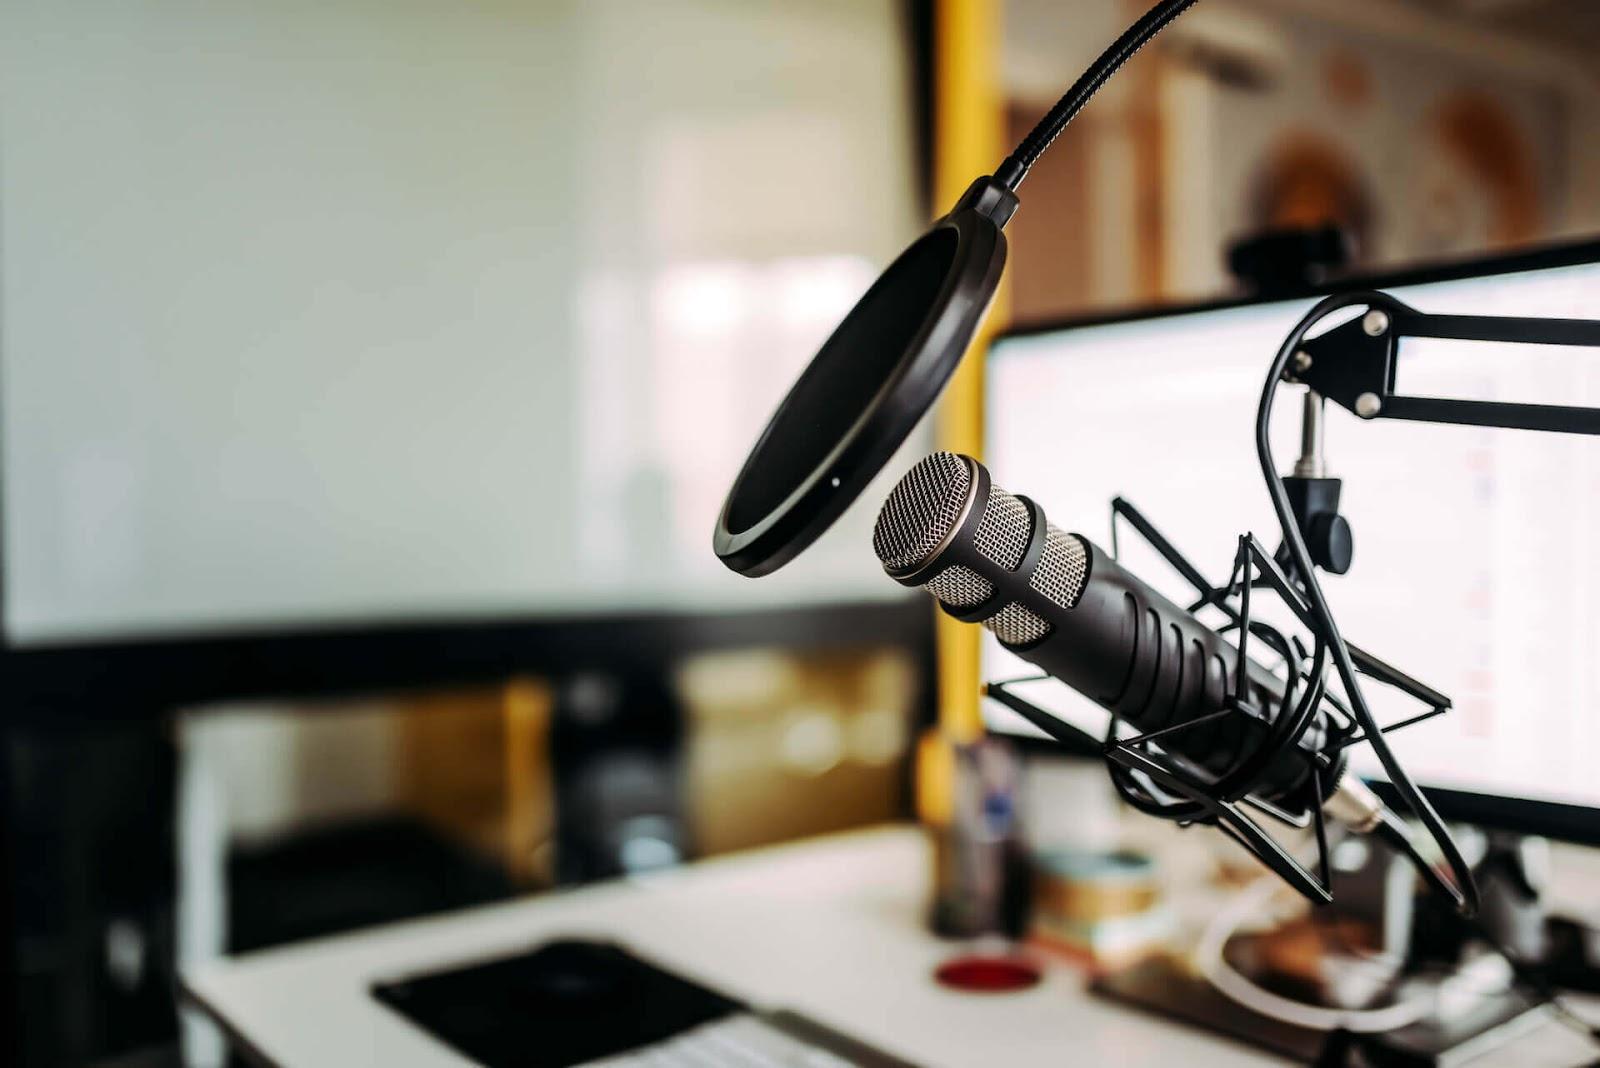 Podcast mirophone